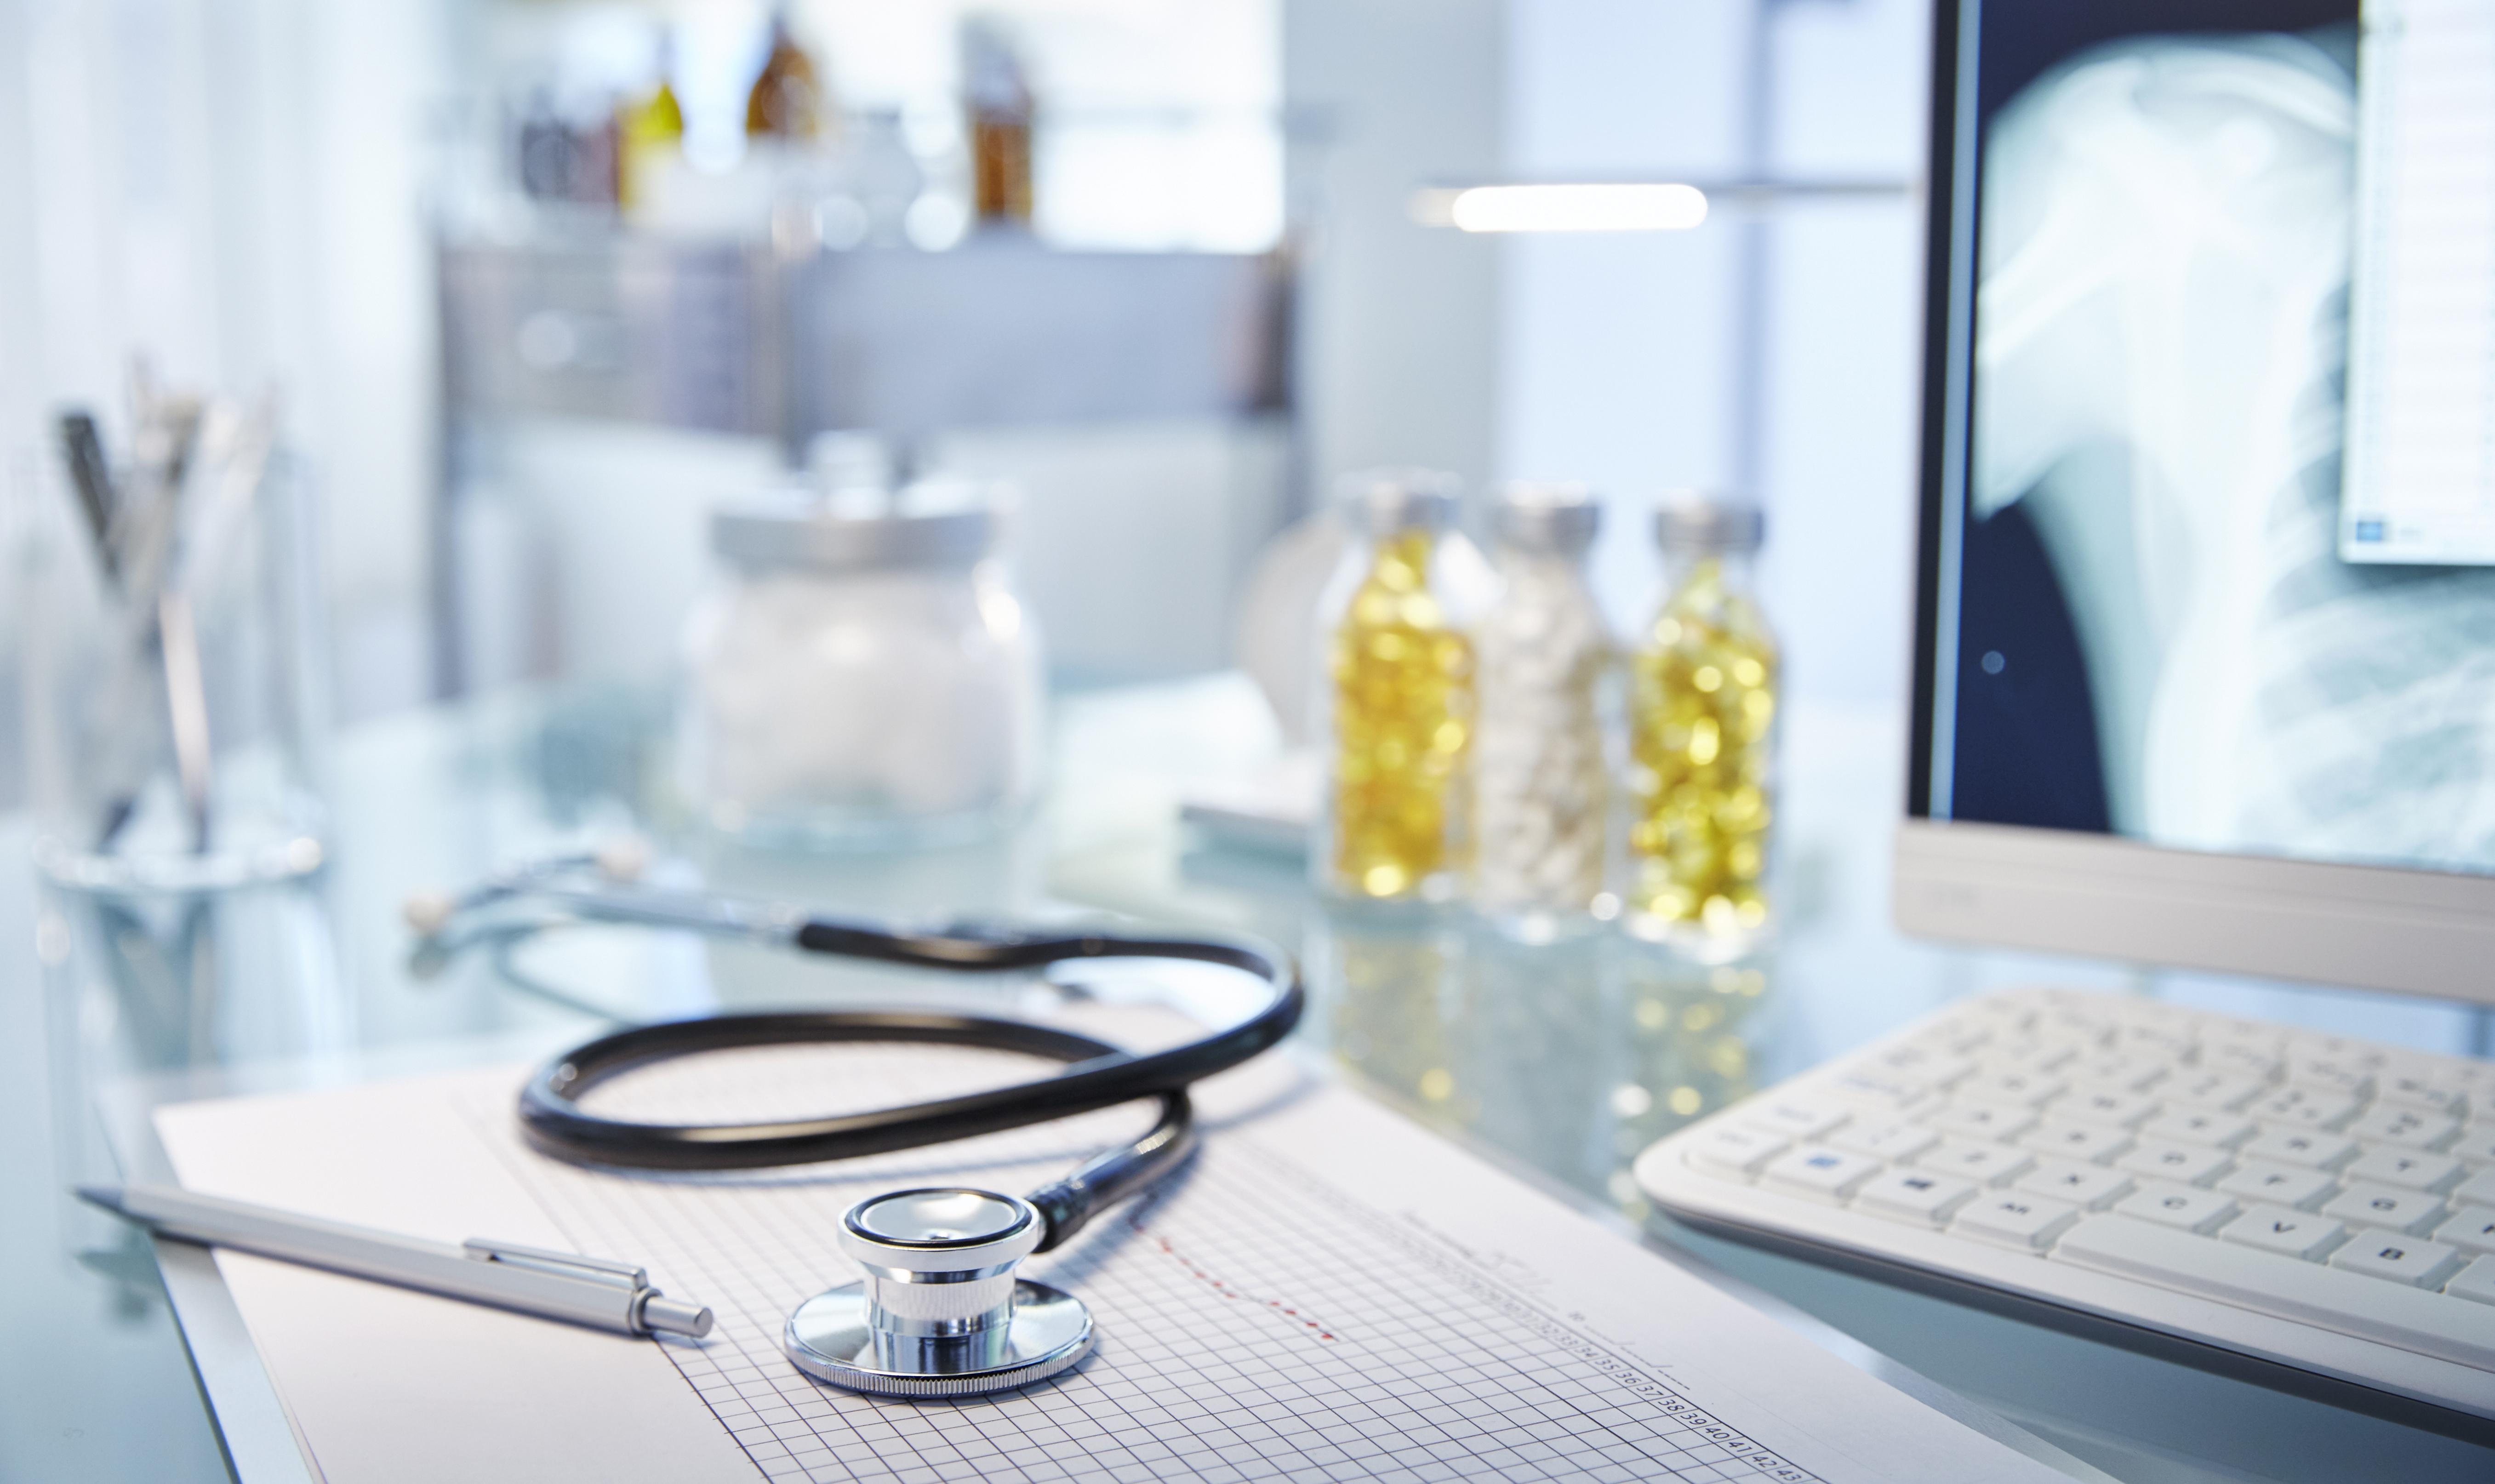 RFB esclarece PIS/COFINS de produtos médicos